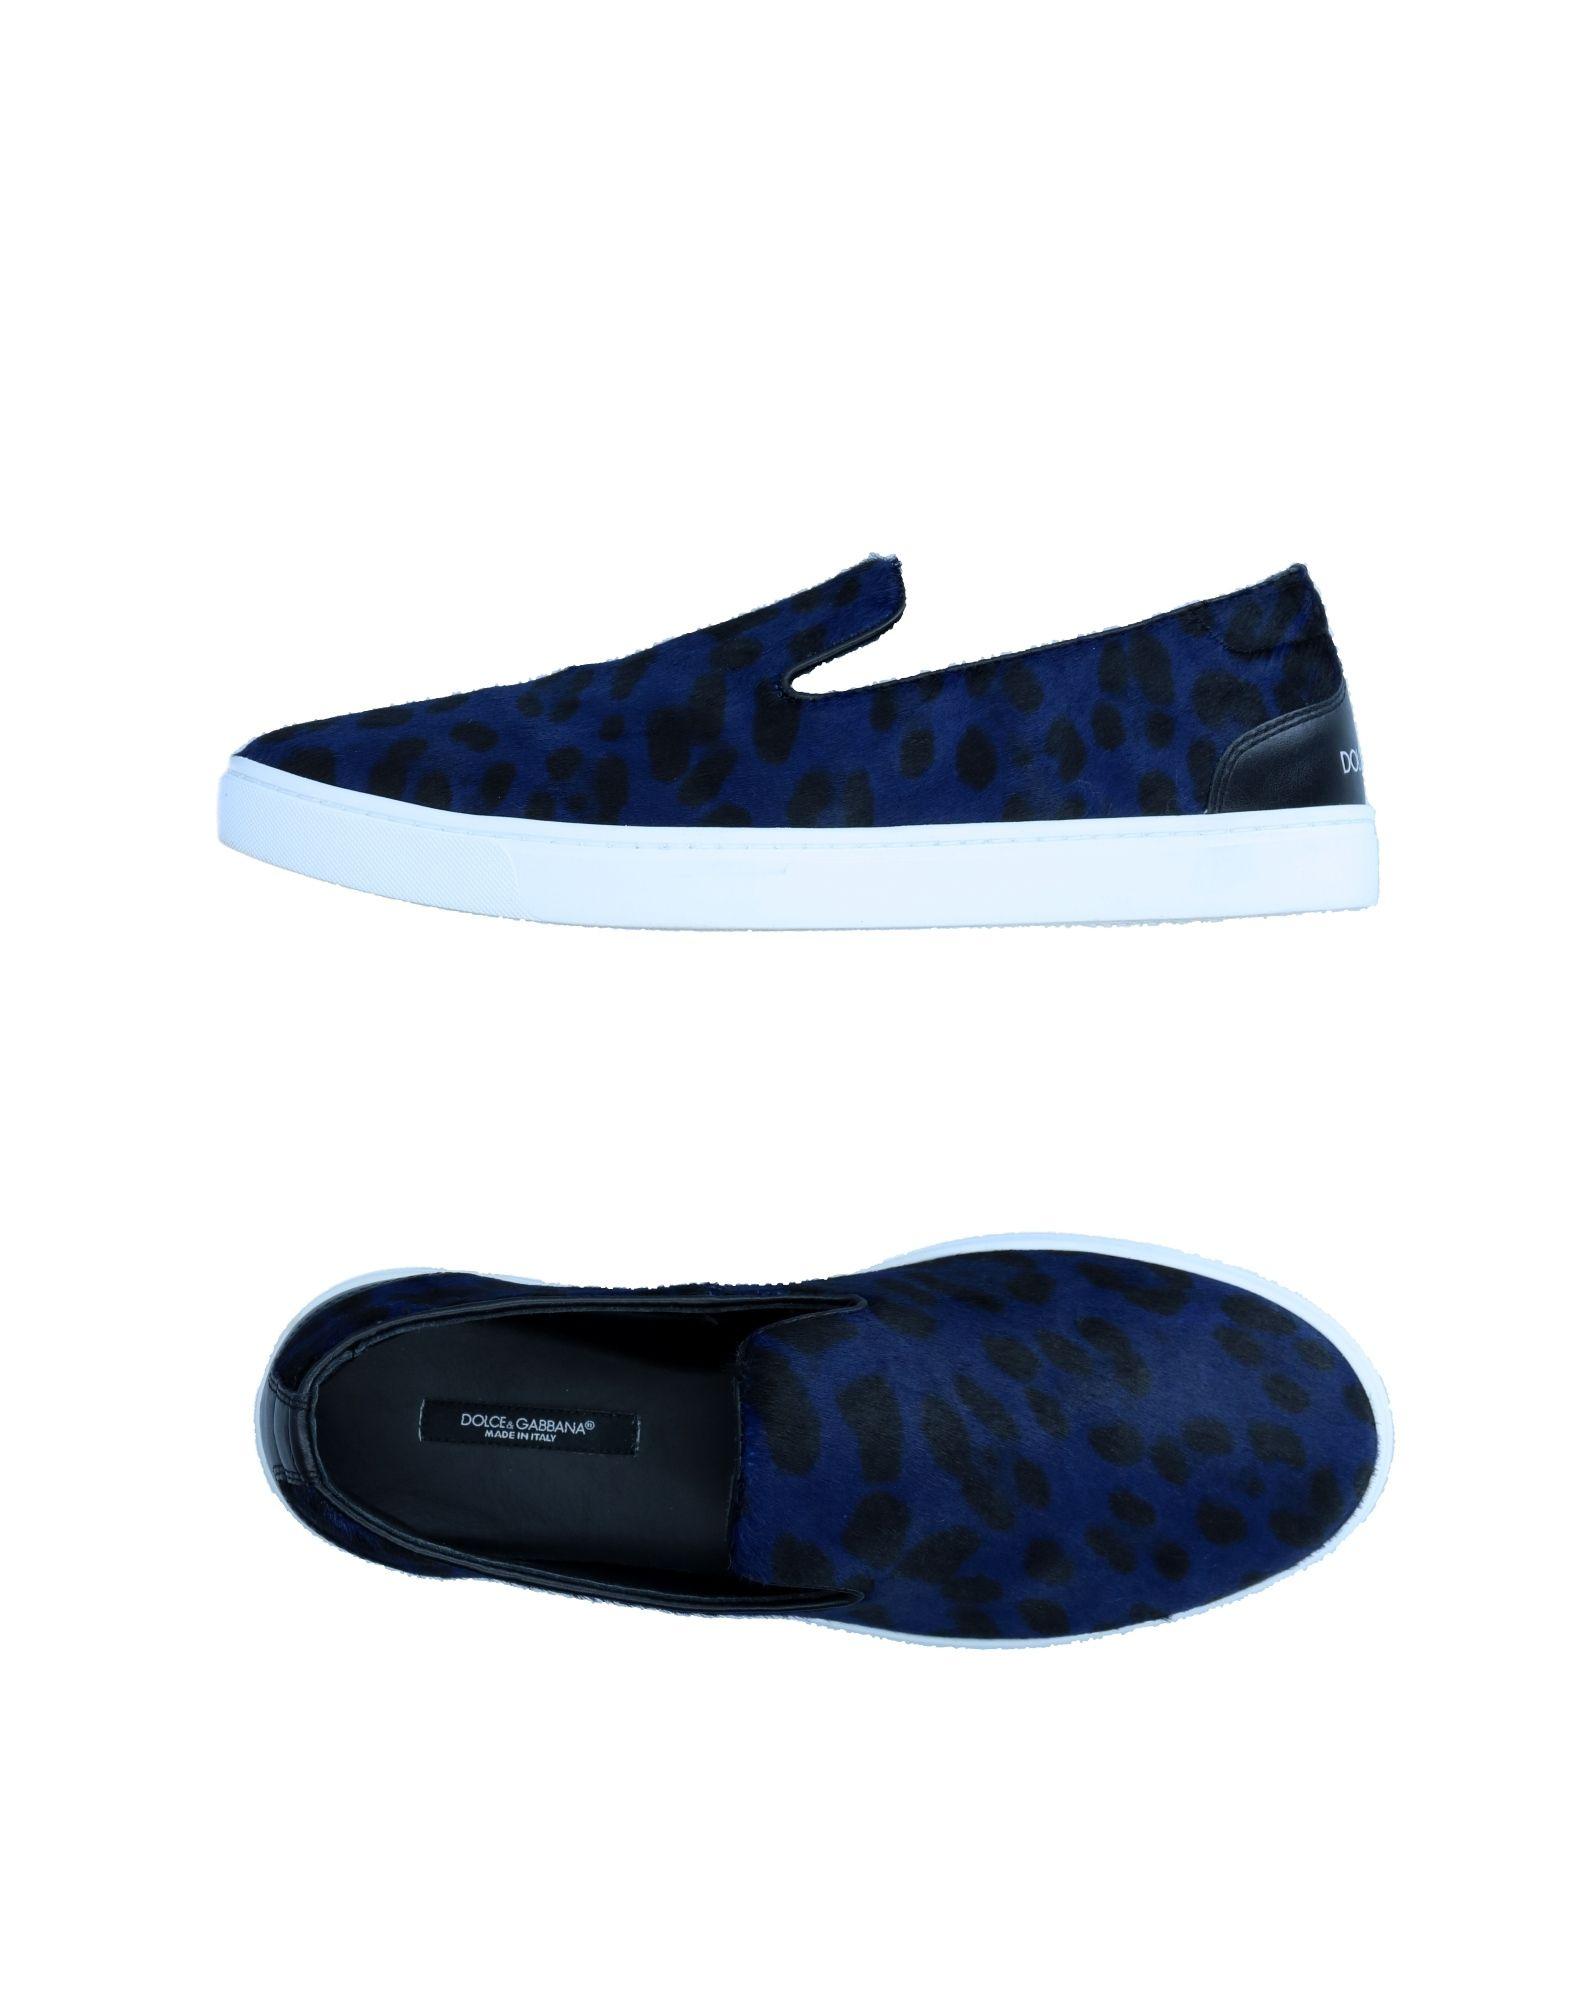 Dolce & Gabbana Sneakers Herren  11233282QW Neue Schuhe